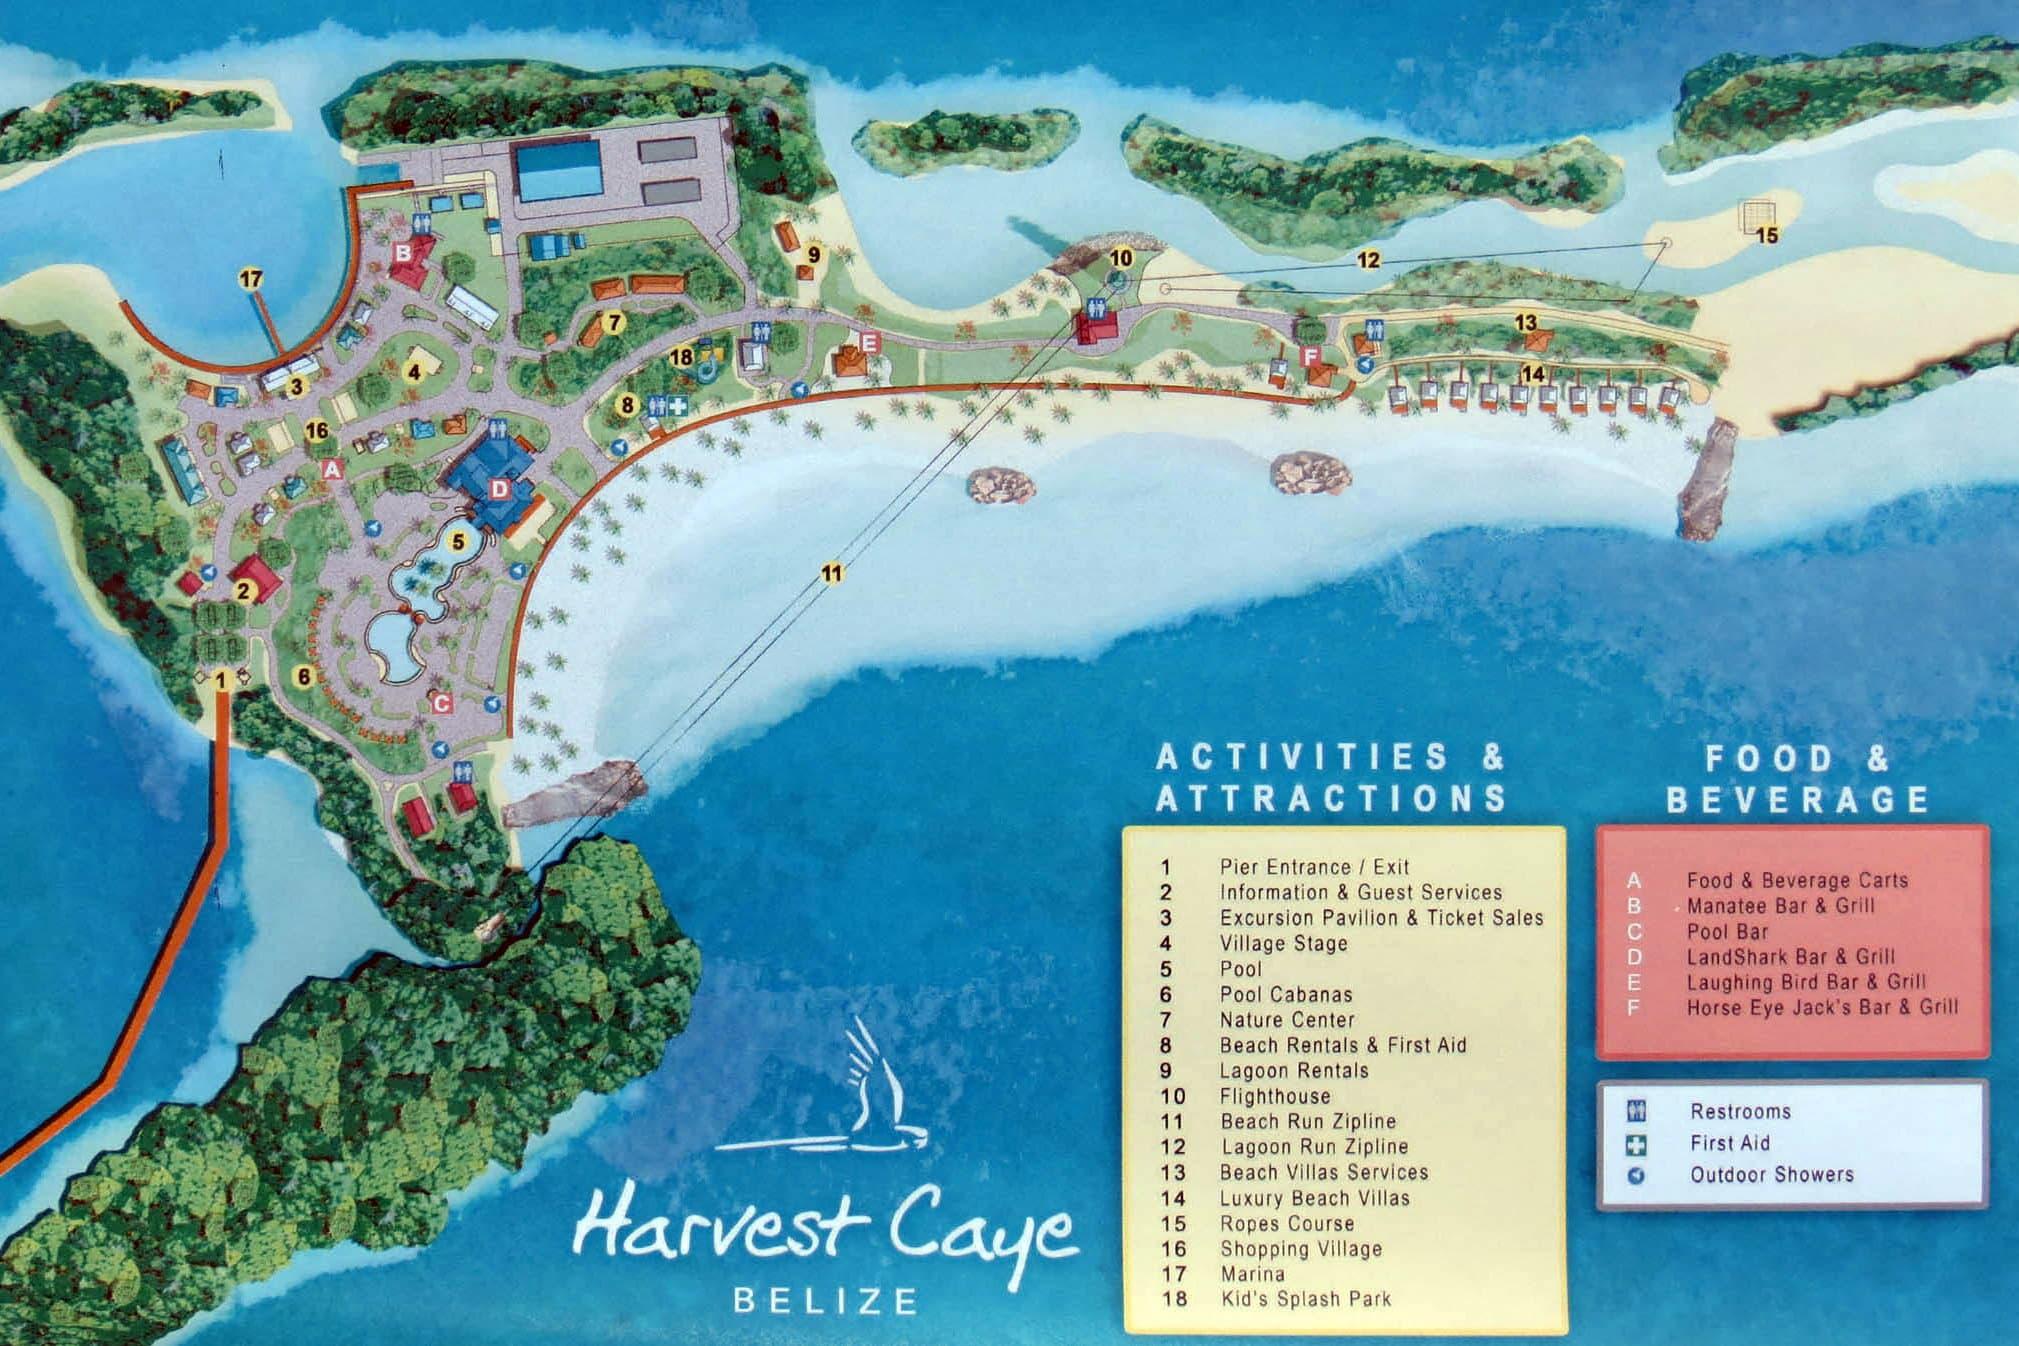 Круизный порт Харвест Кей / Harvest Caye